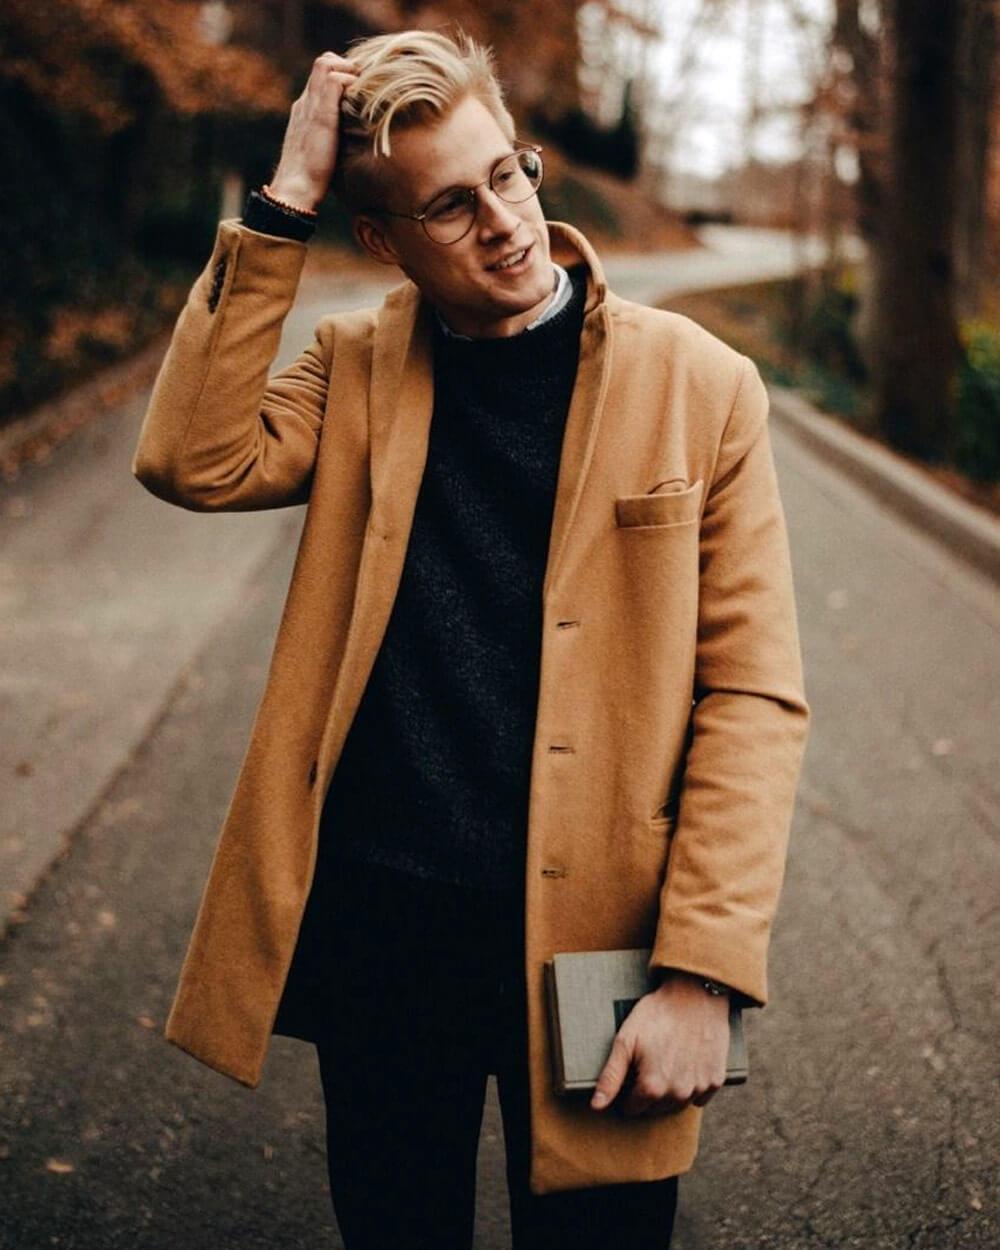 Dark tweed sweater with a light brown jacket